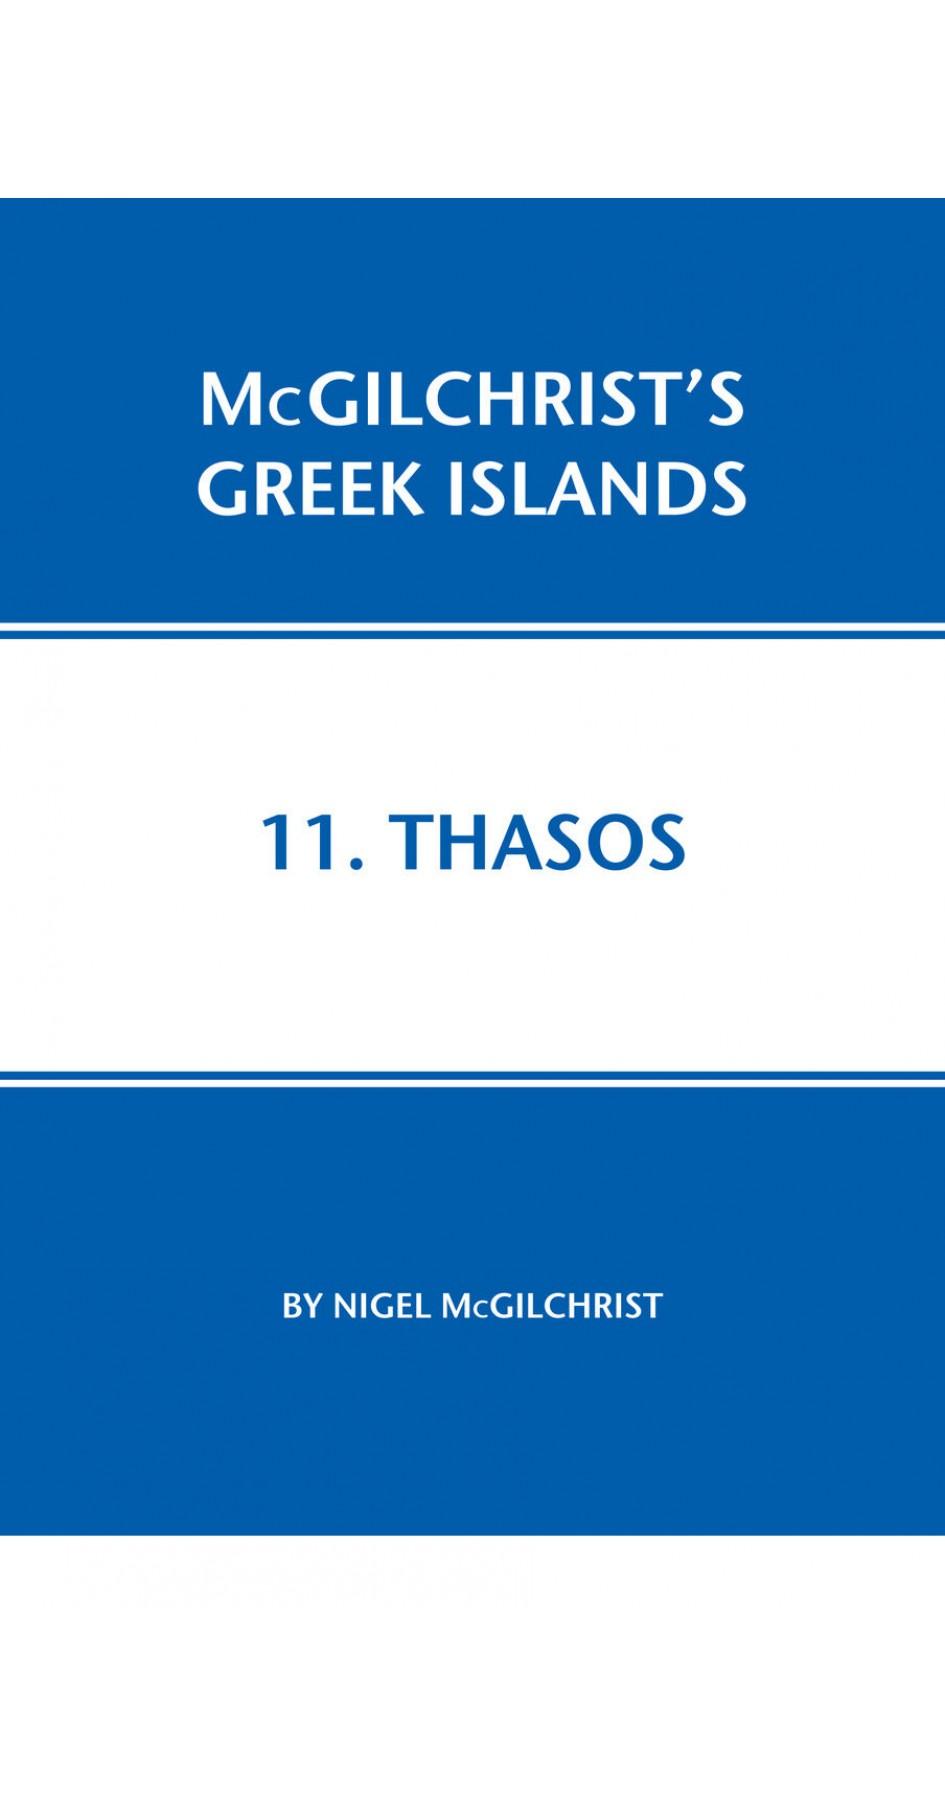 11. Thasos - McGilchrist's Greek Islands